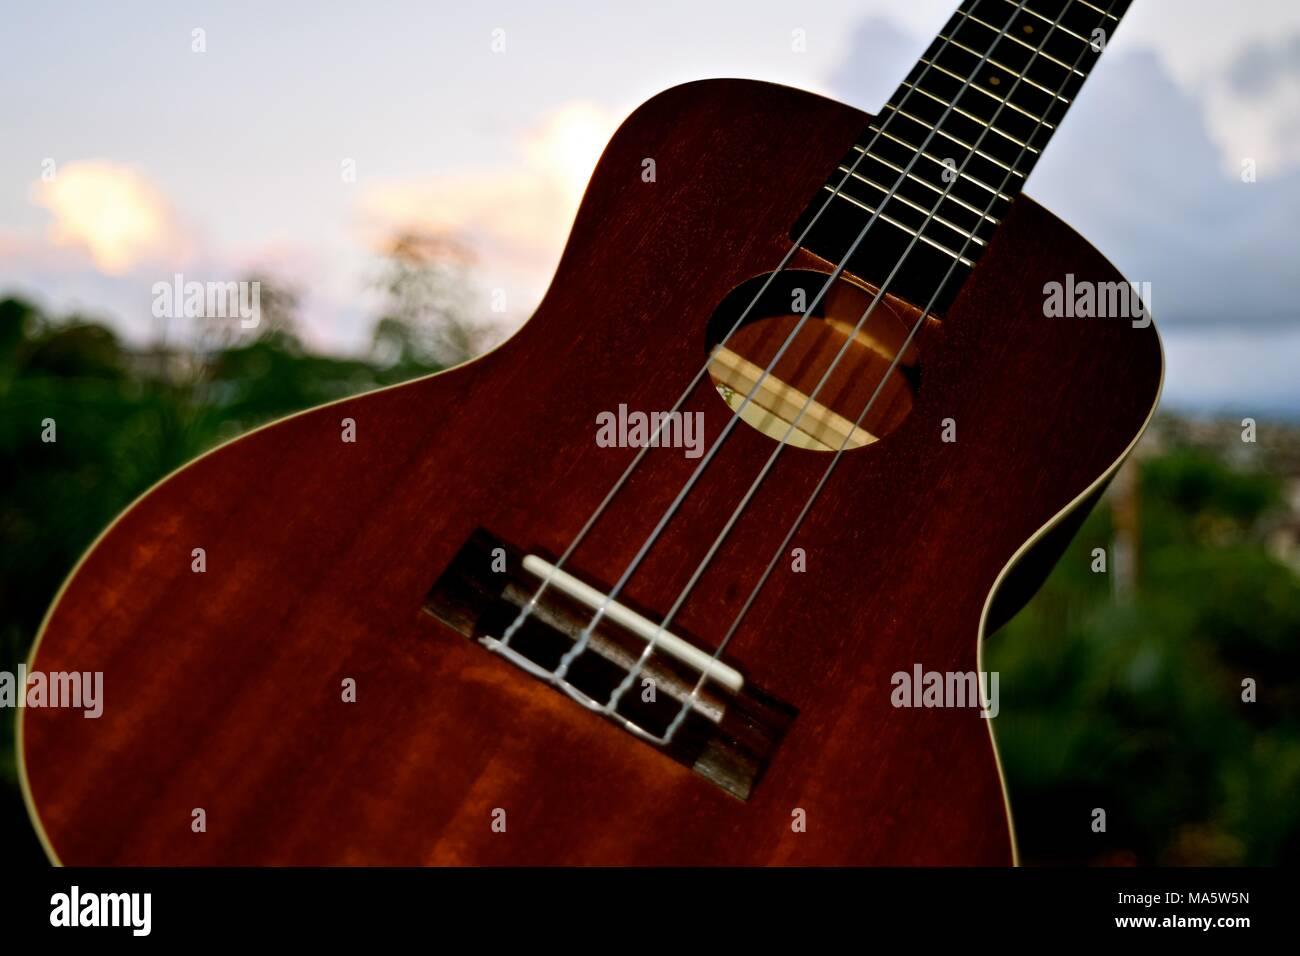 guitar like stock photos guitar like stock images alamy. Black Bedroom Furniture Sets. Home Design Ideas